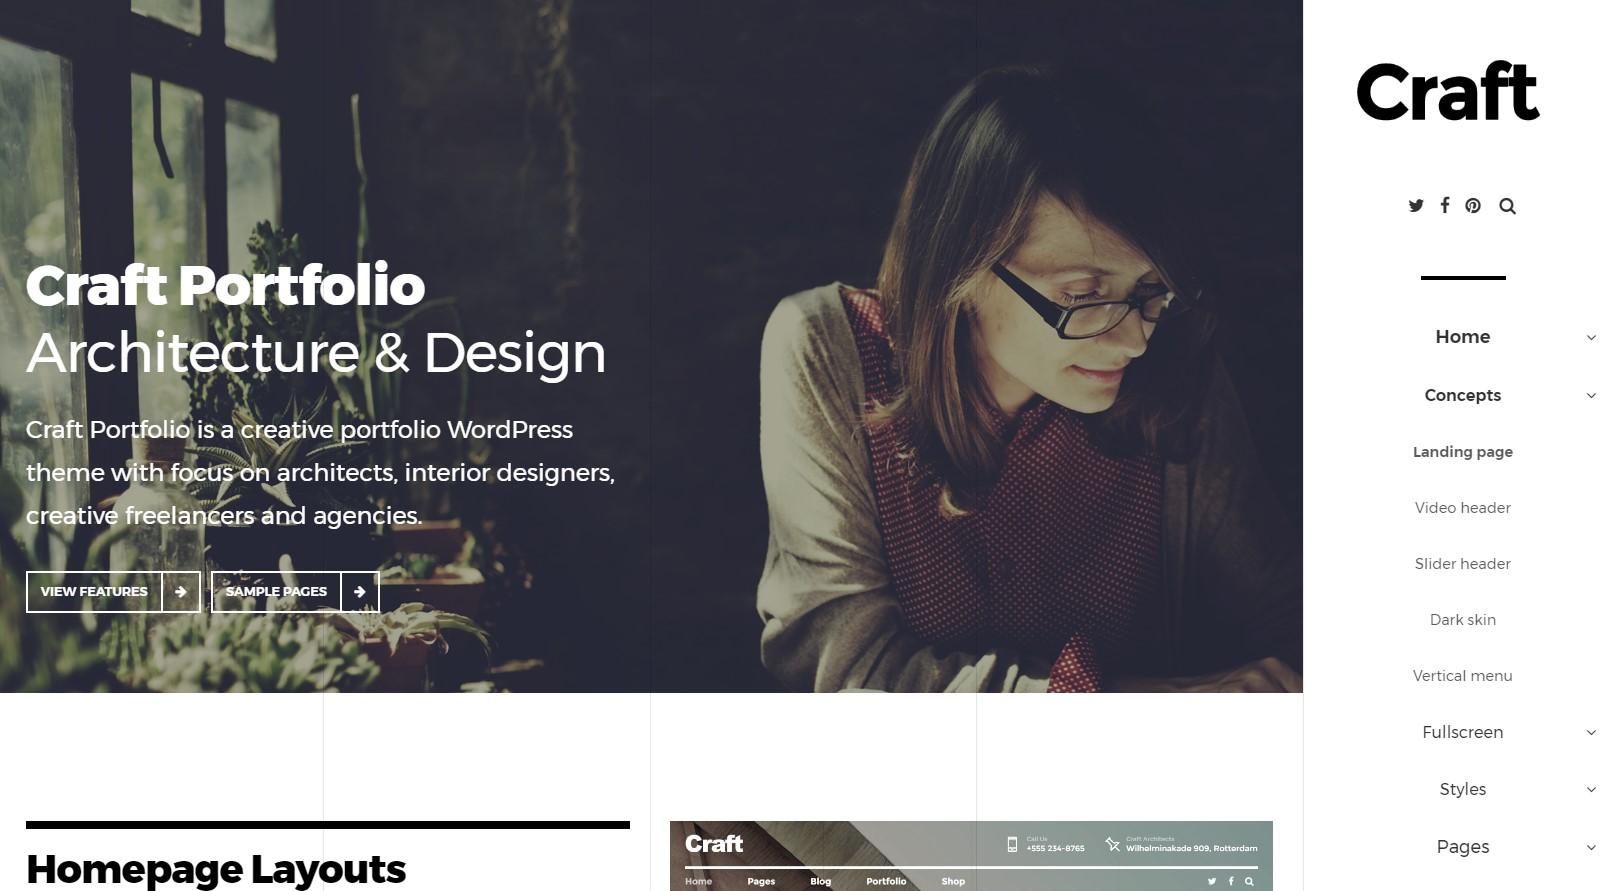 https://documentation.bold-themes.com/craft-portfolio/wp-content/uploads/sites/24/2017/09/menu-vertical-right.jpg